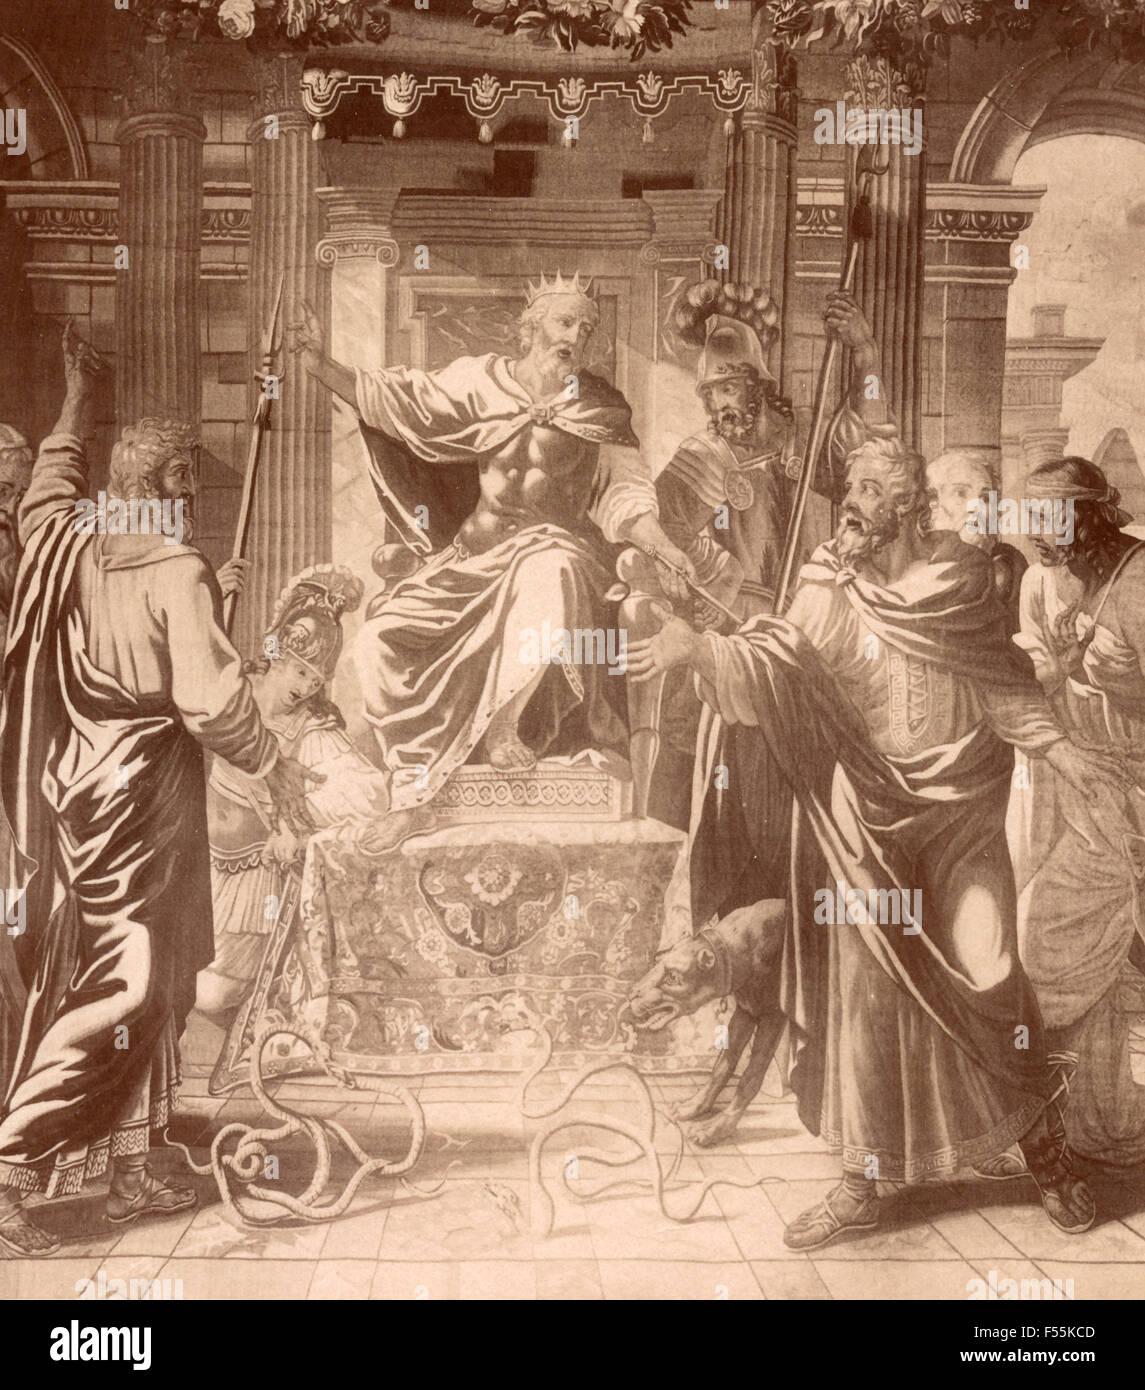 Palazzo Clerici, Milan: Tapestry depicting Herod - Stock Image